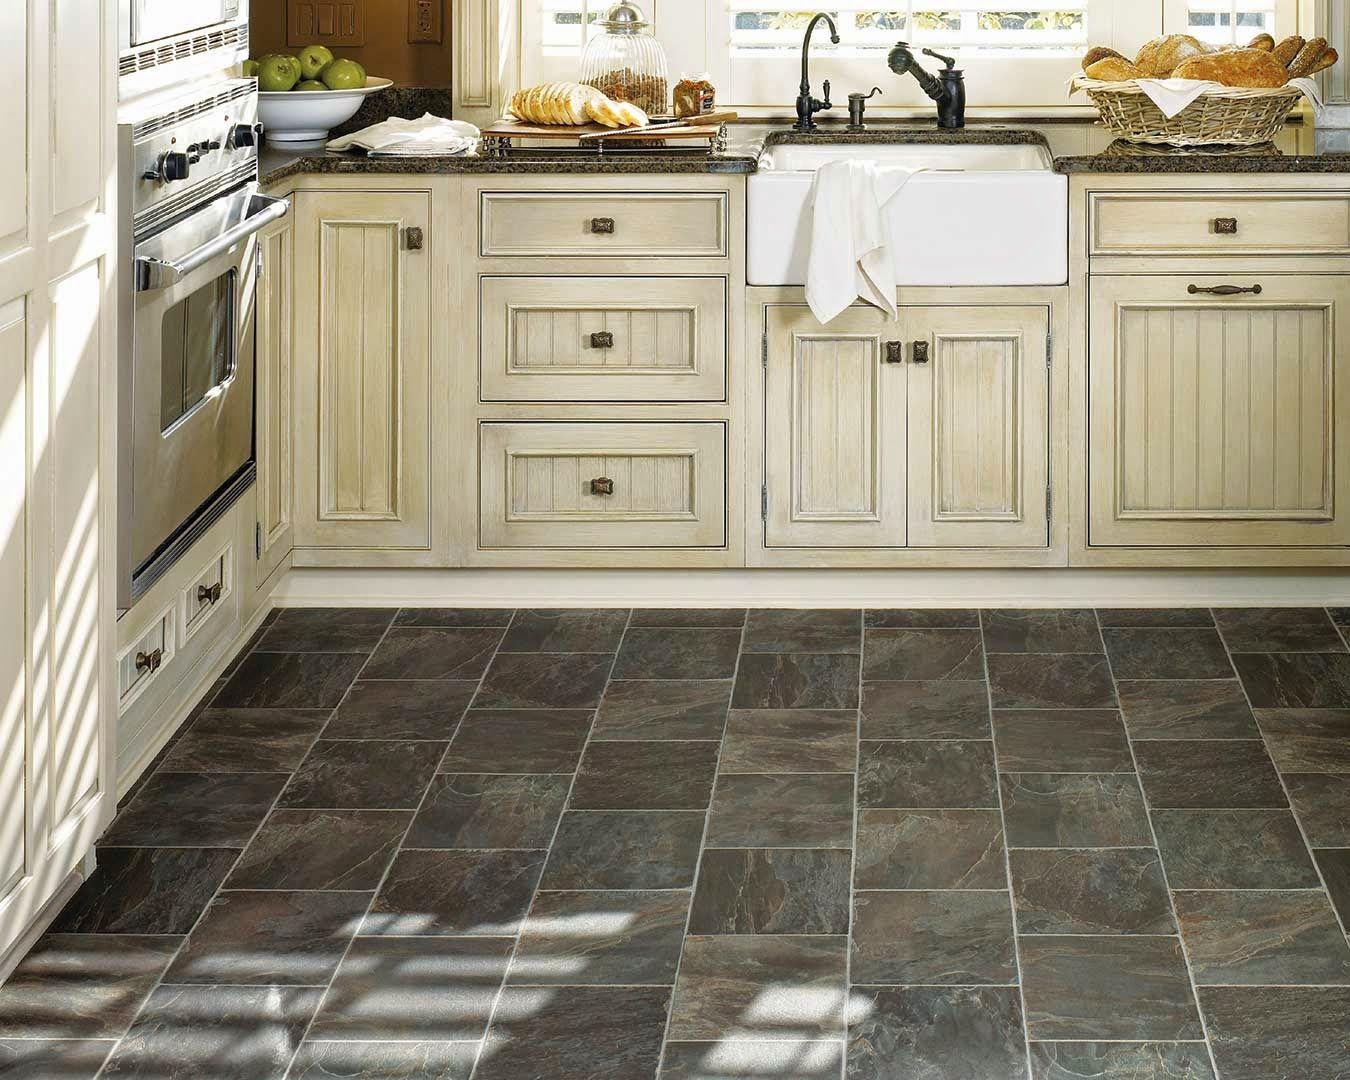 types of kitchen flooring pickled oak cabinets dark floors Best Black Vinyl Sheet Flooring For Small Kitchen With Old